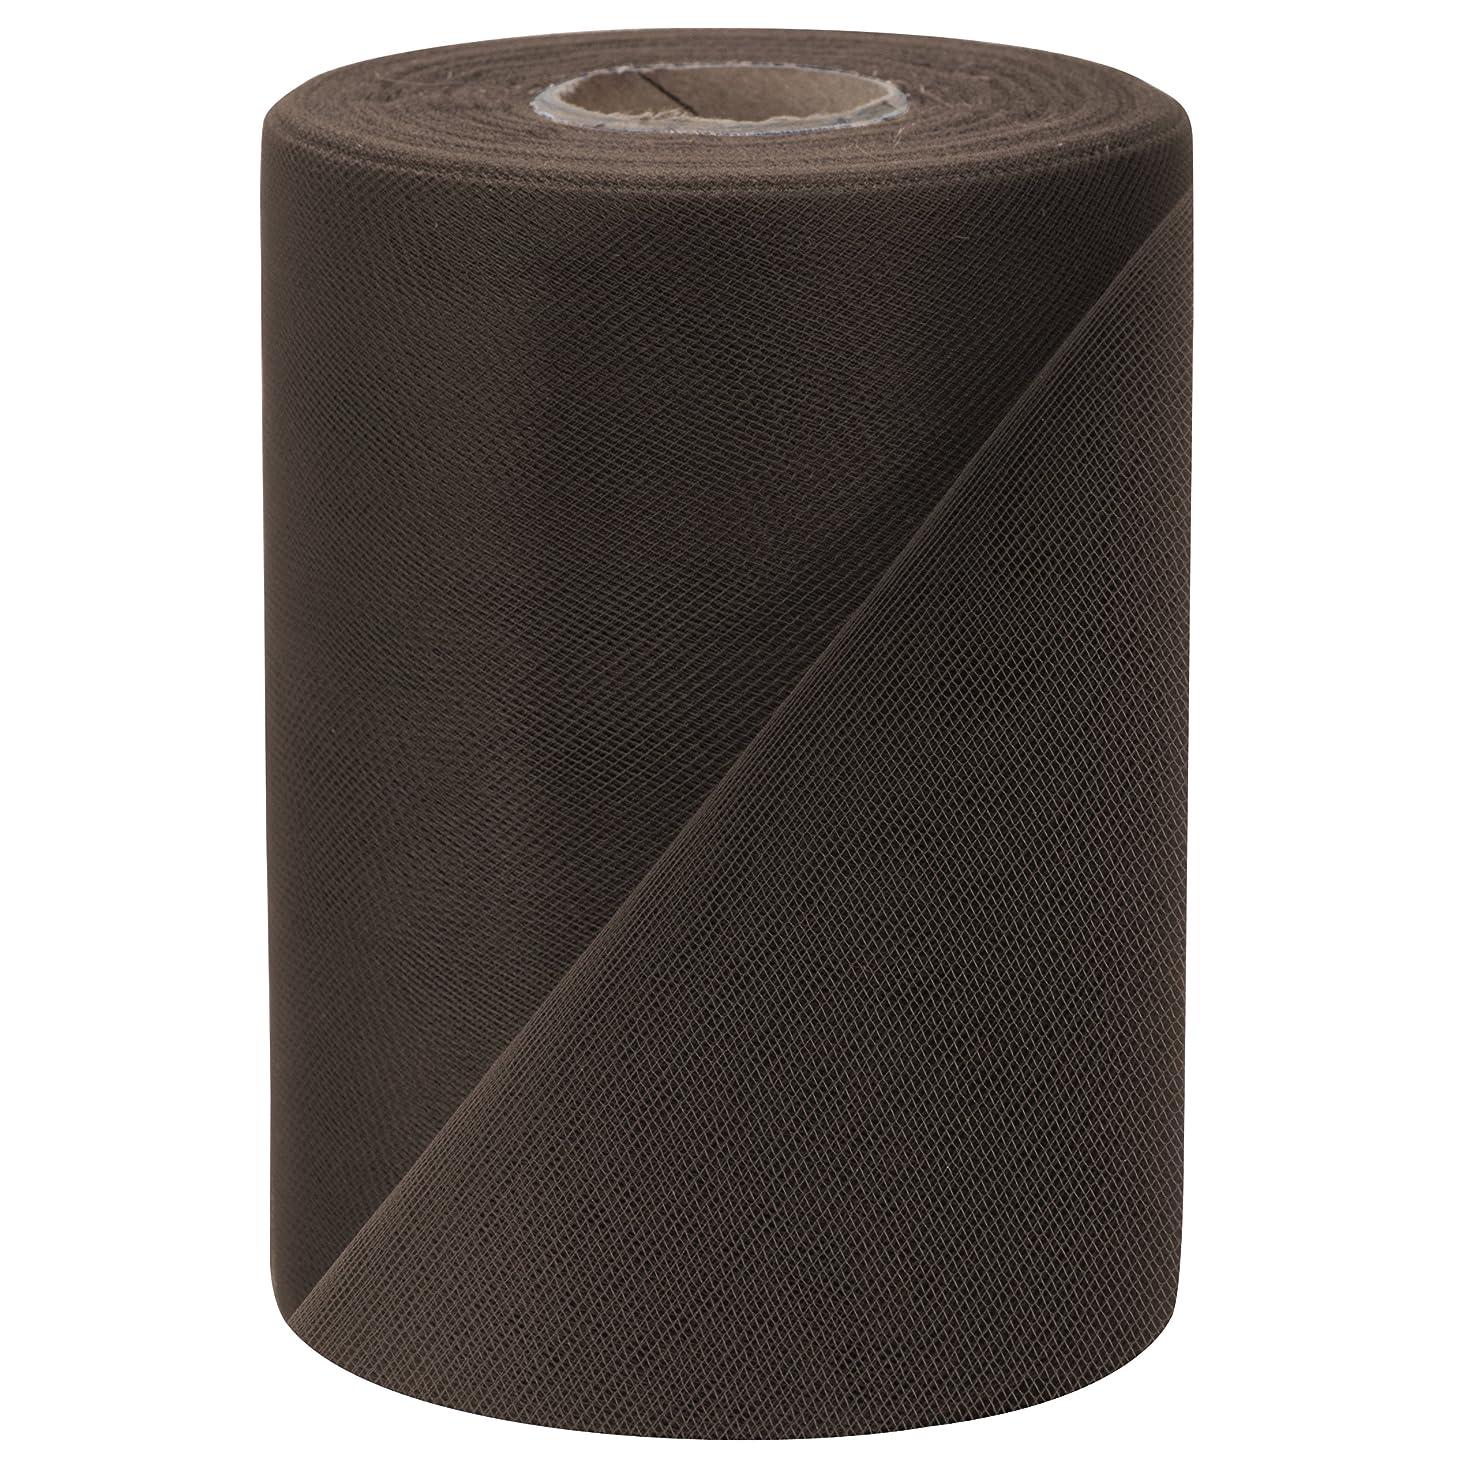 Falk Fabrics Tulle Spool, 6-Inch by 100-Yard, Brown